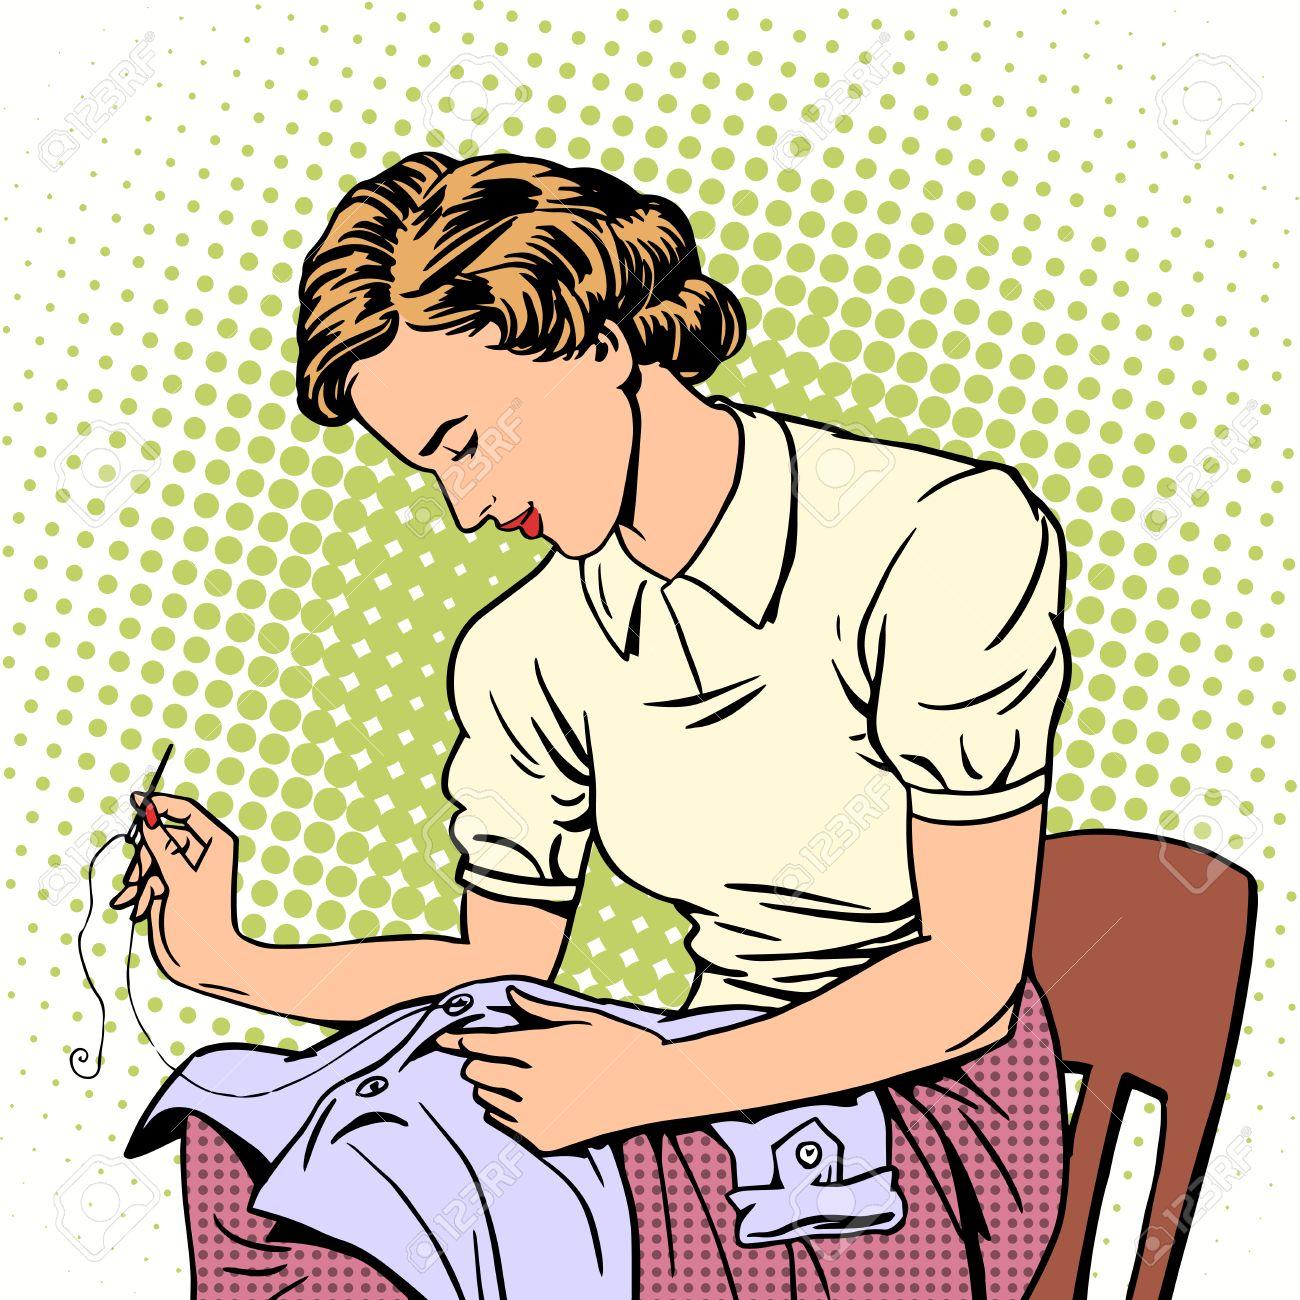 1300x1300 Woman Sews Shirt Thread Housewife Housework Comfort Retro Style